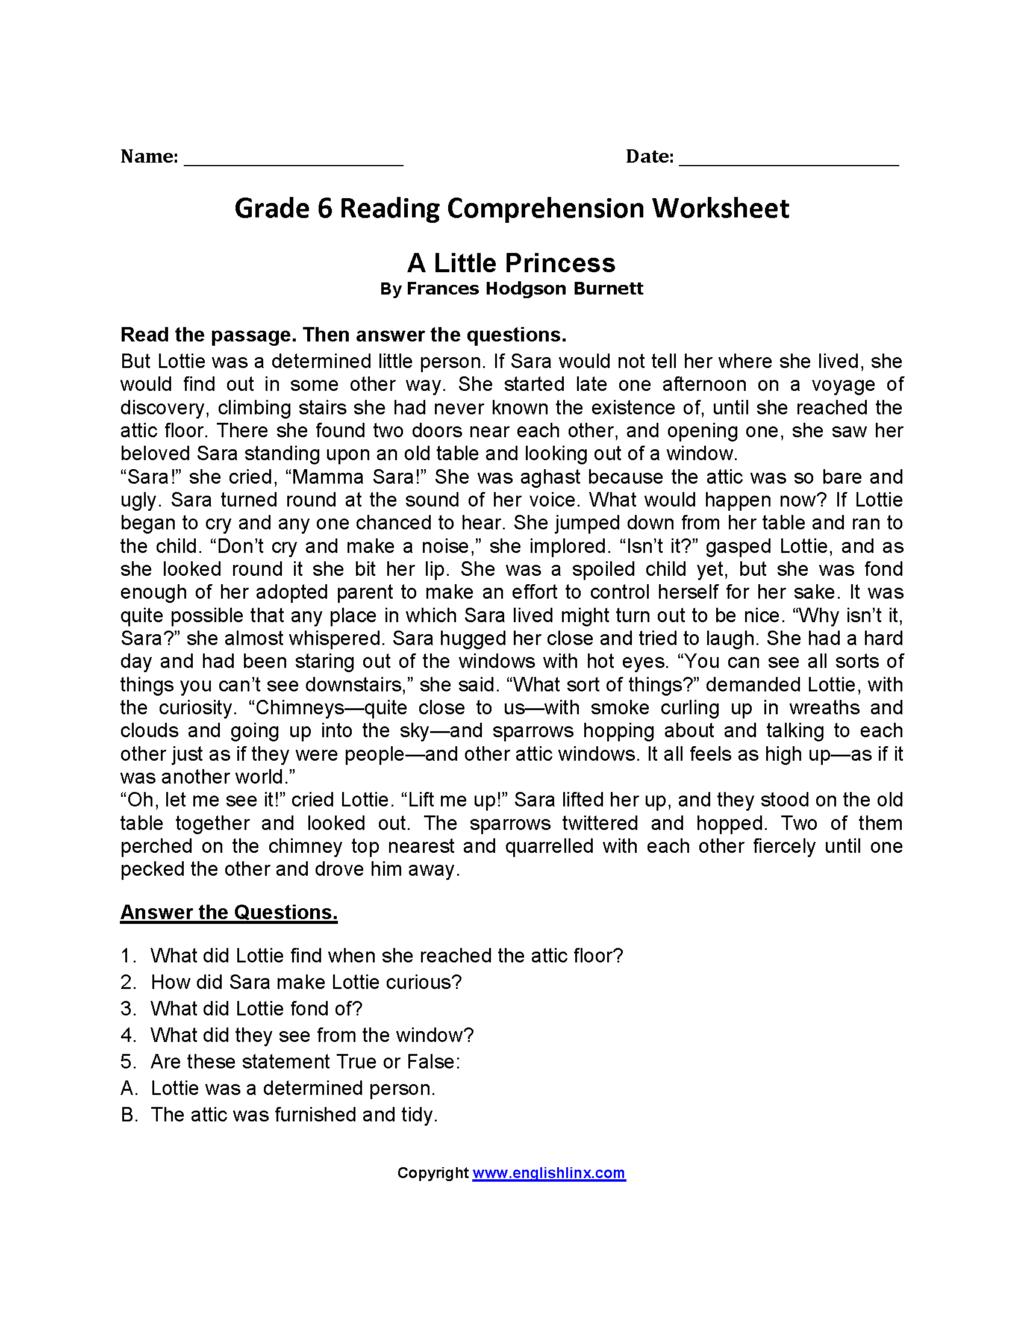 Free Printable 6th Grade Reading Comprehension Worksheets